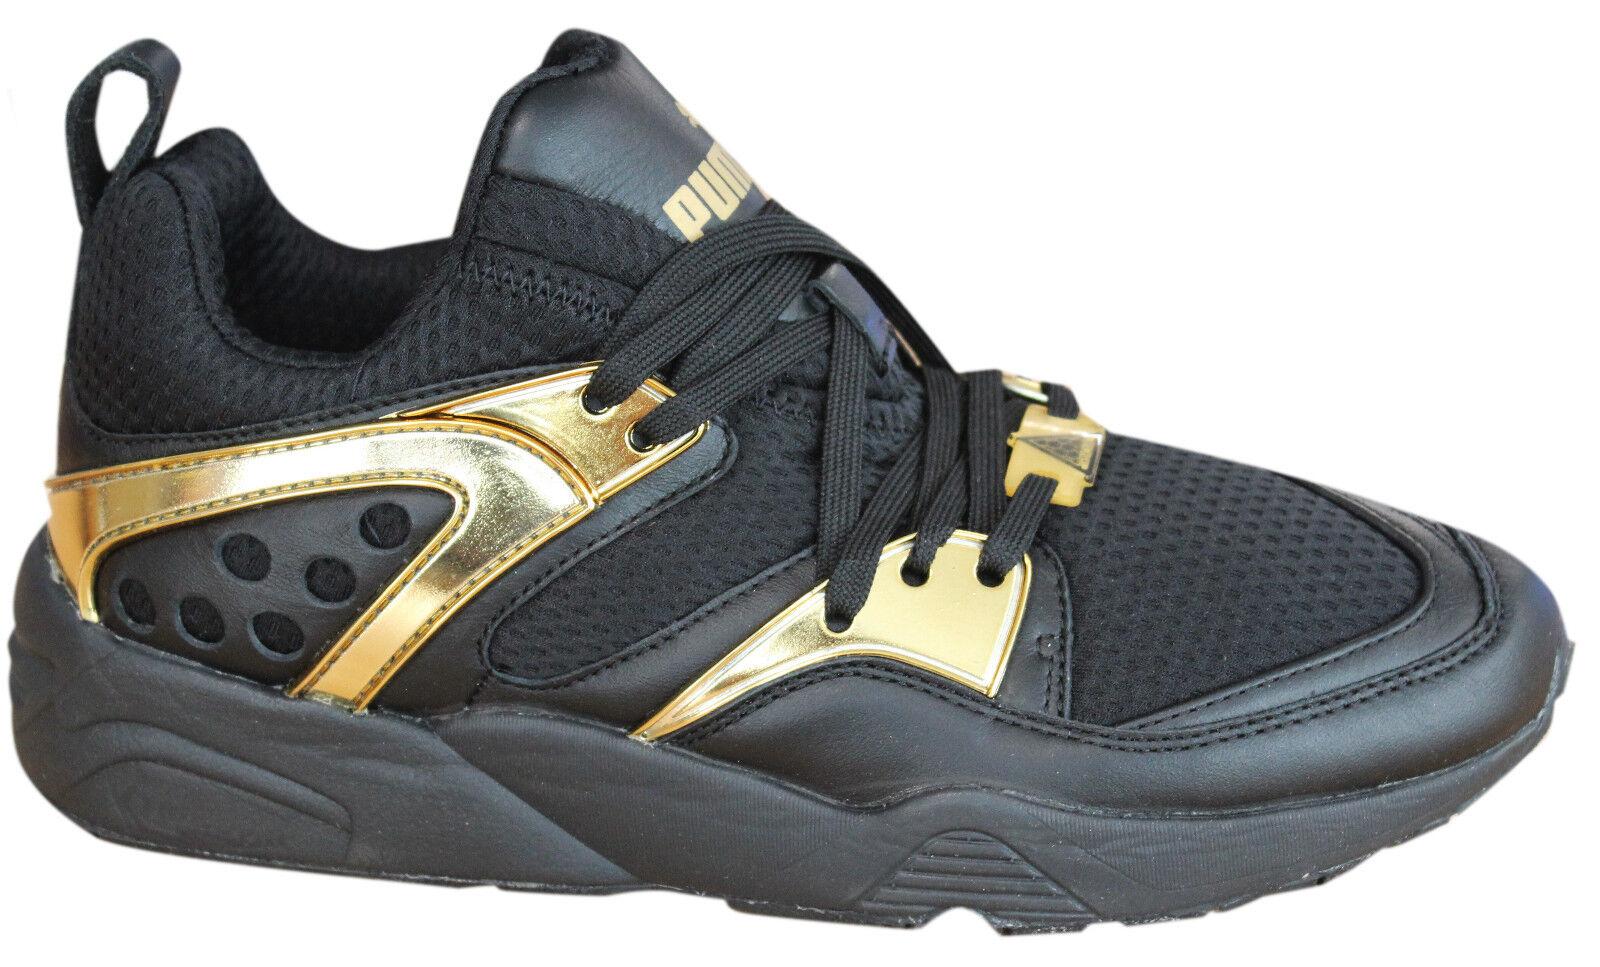 NEU Puma Trinomic Blaze of Glory Reflective 41 Herren Schuhe Sneaker 362188-01